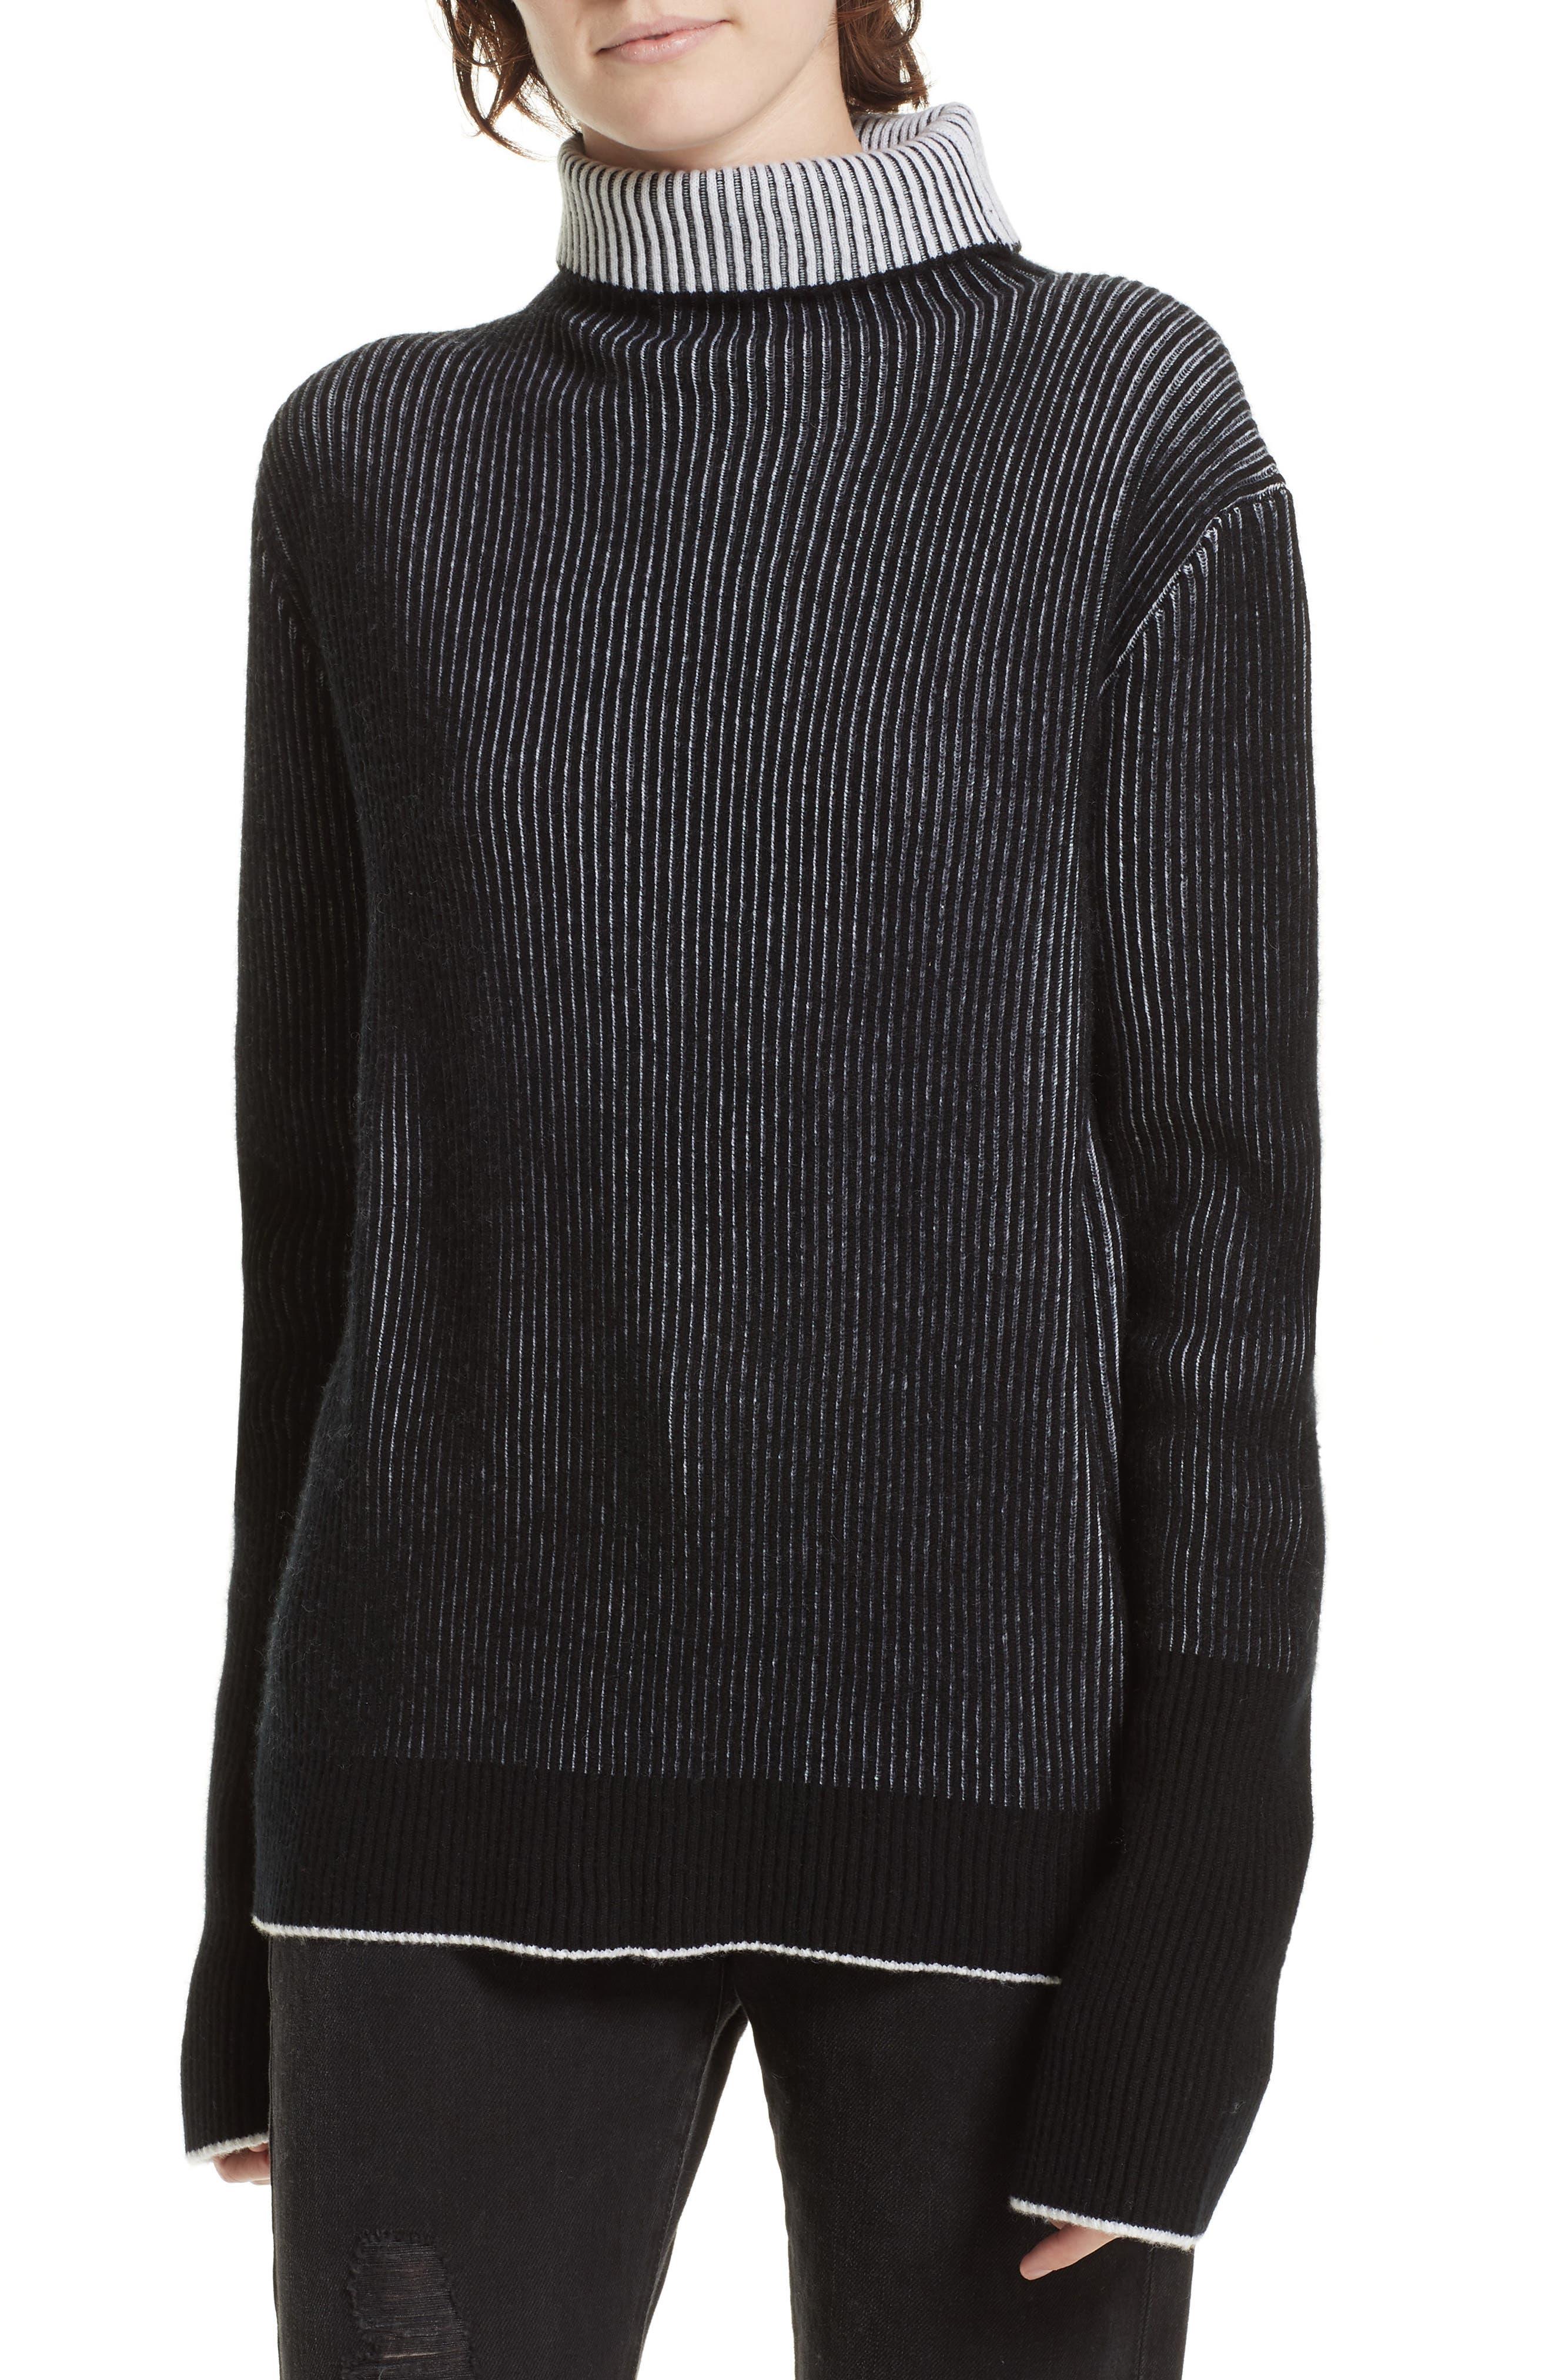 AAA Turtleneck Cashmere Sweater,                             Main thumbnail 1, color,                             BLACK/ CREAM